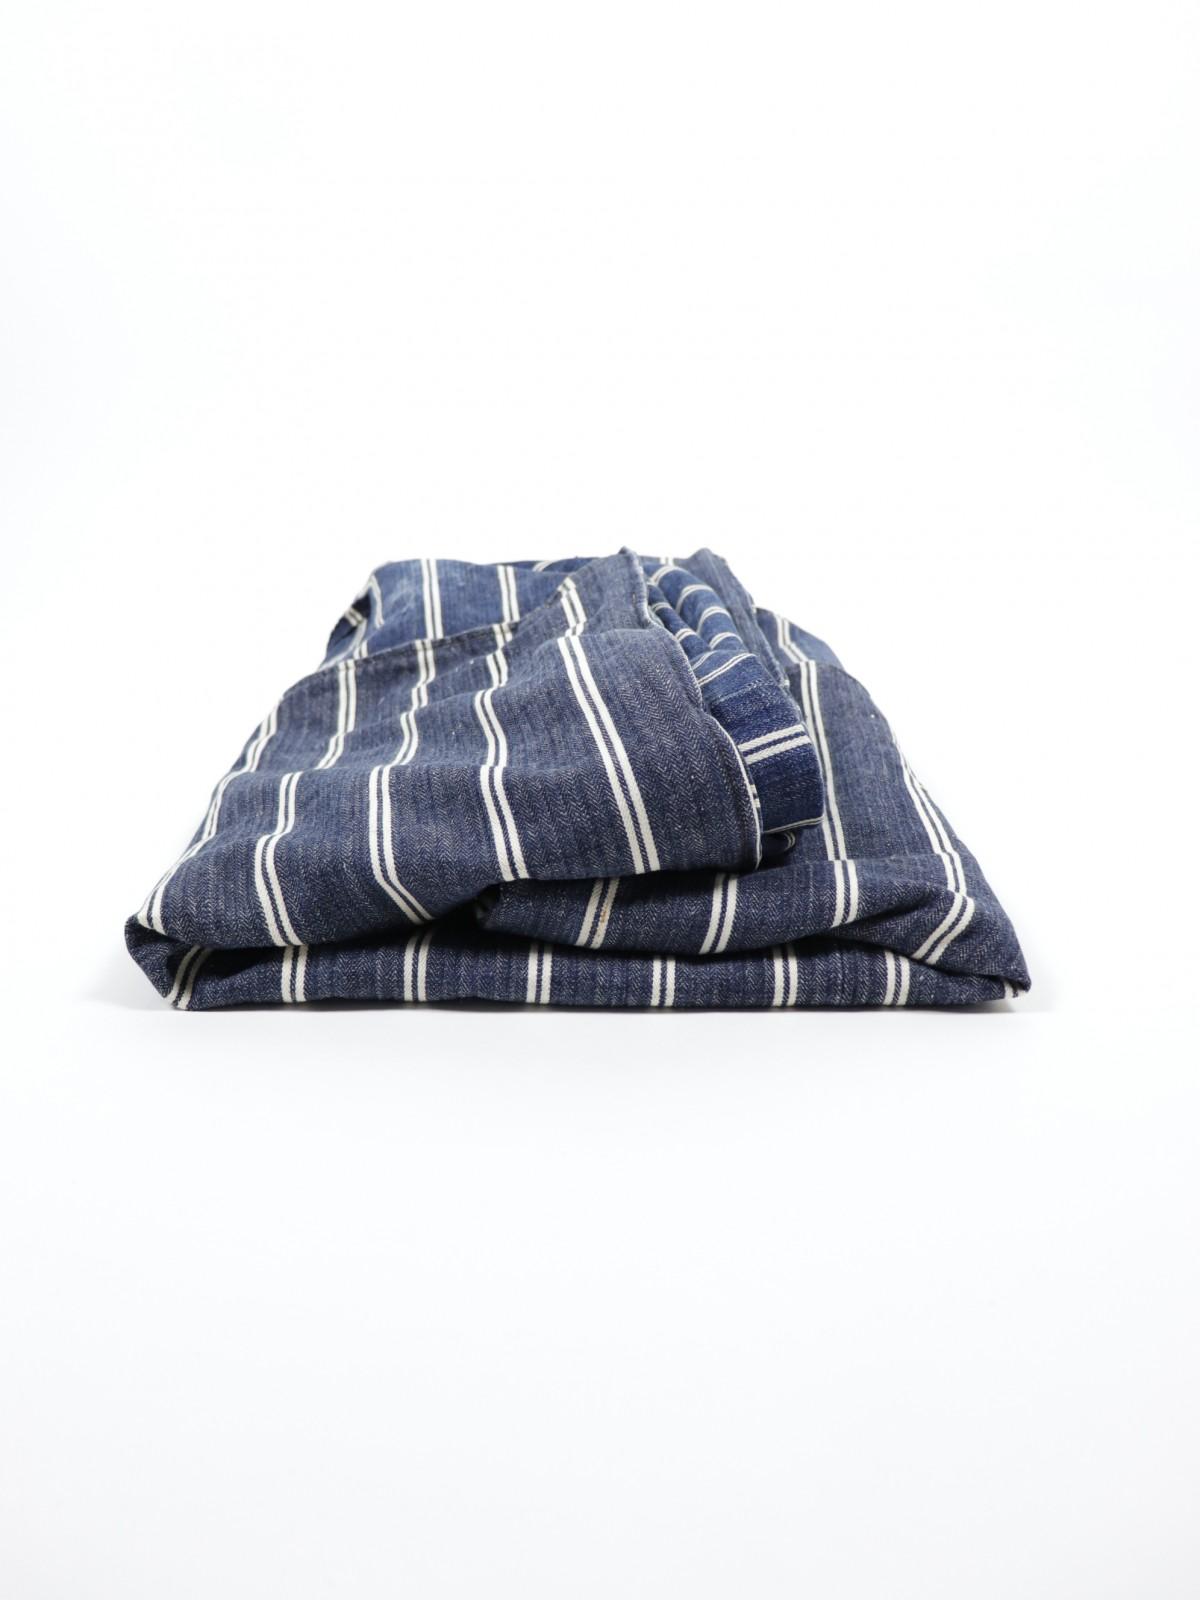 1960's, Italian denim fabric, upholstery fabric, Italy